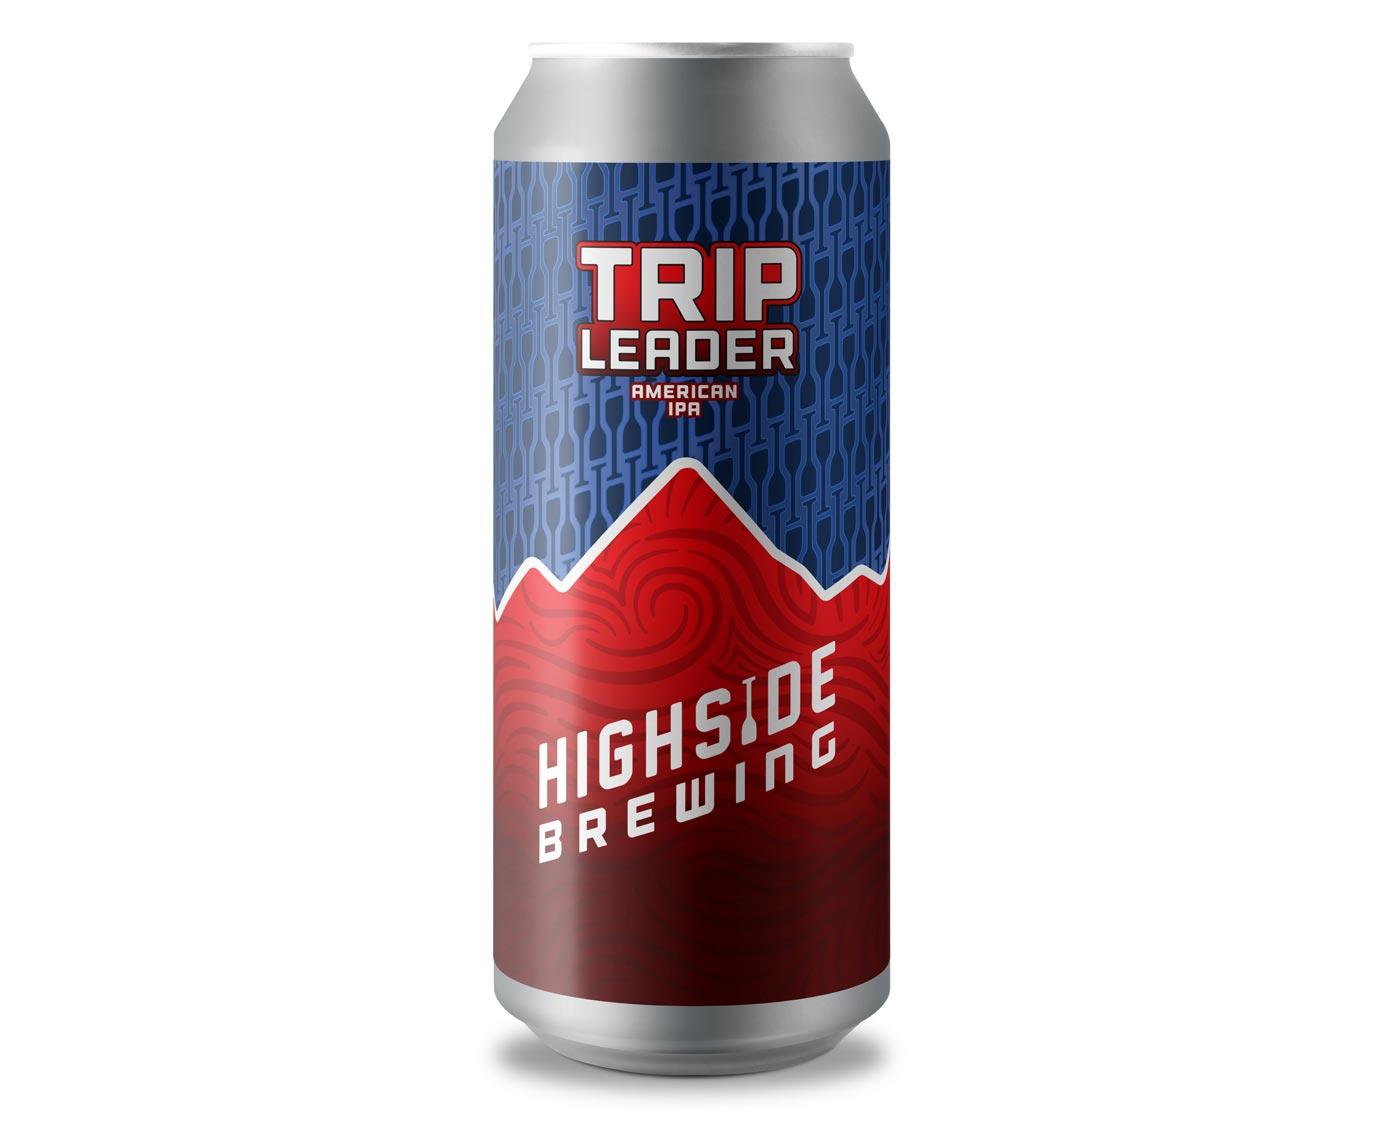 Trip Leader